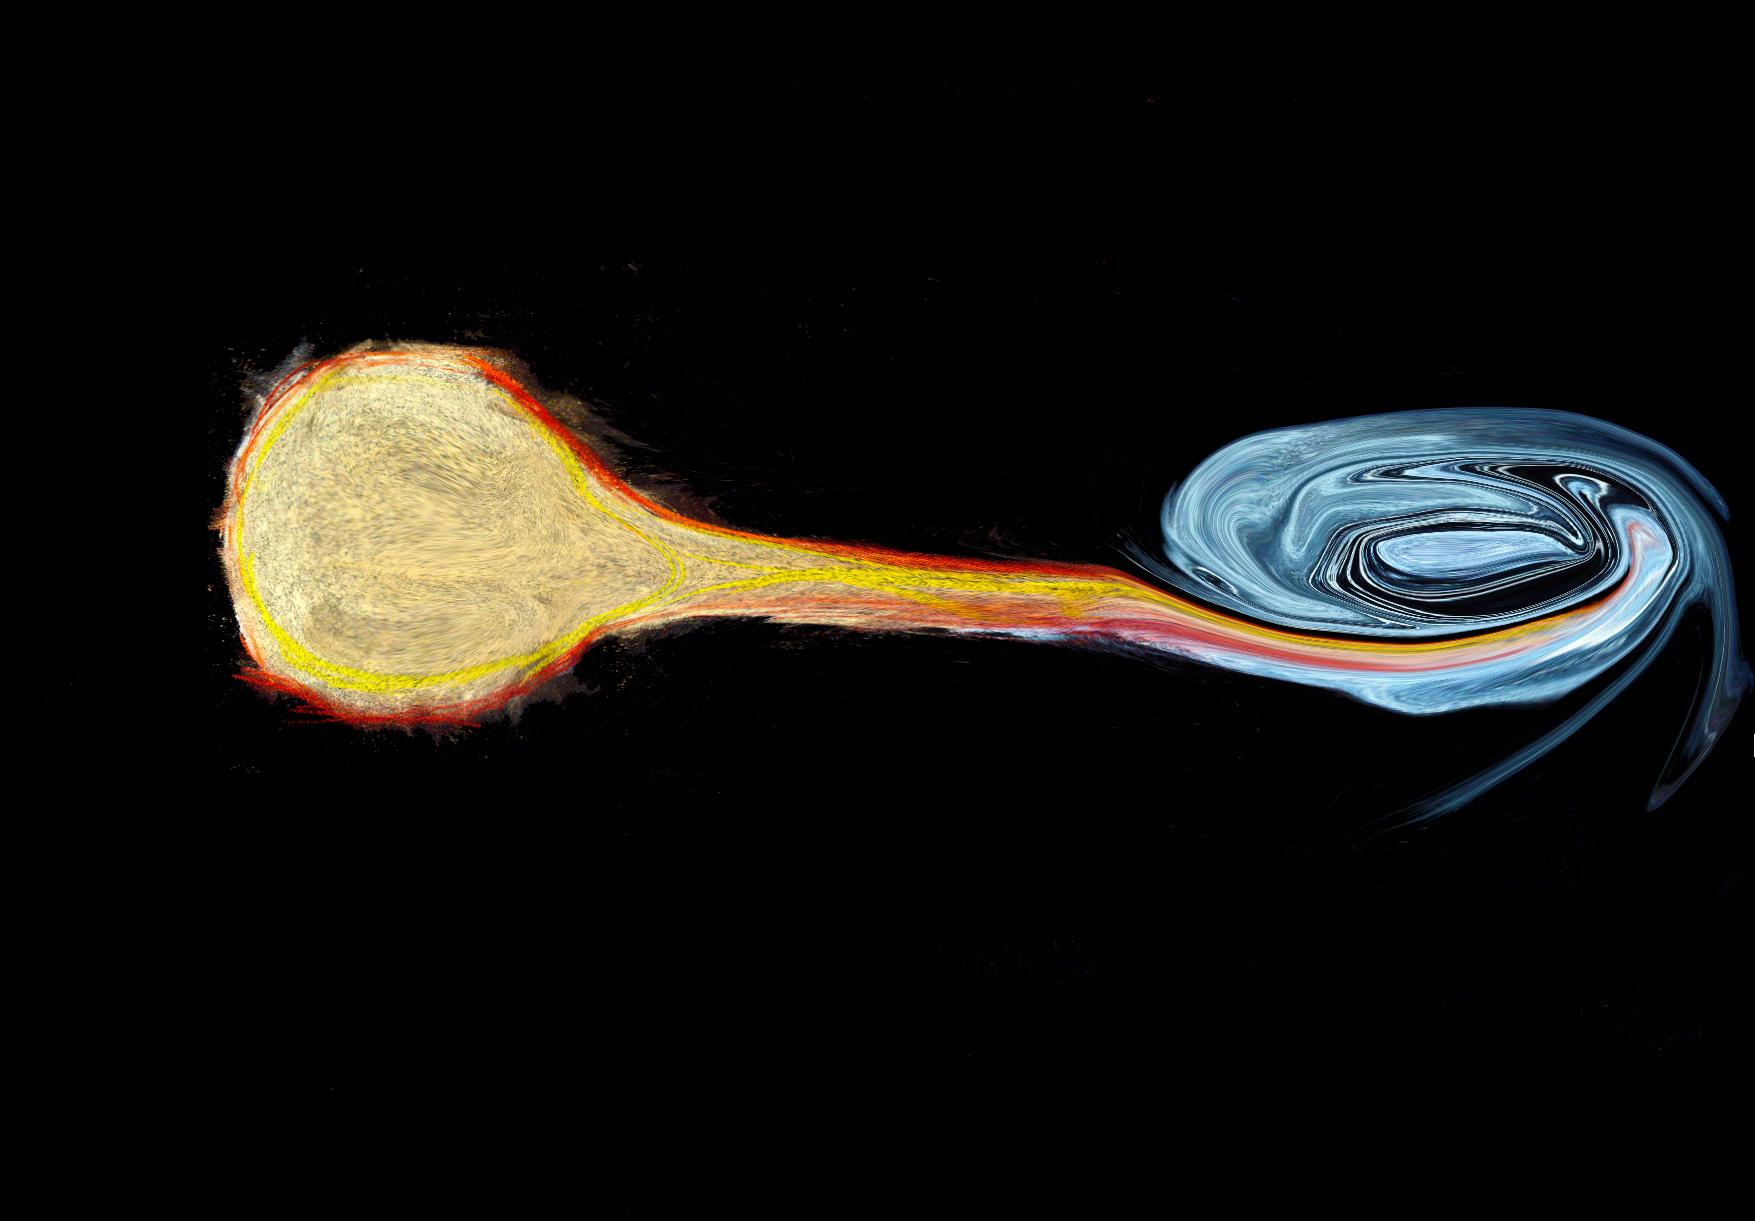 black hole consuming a star - photo #21